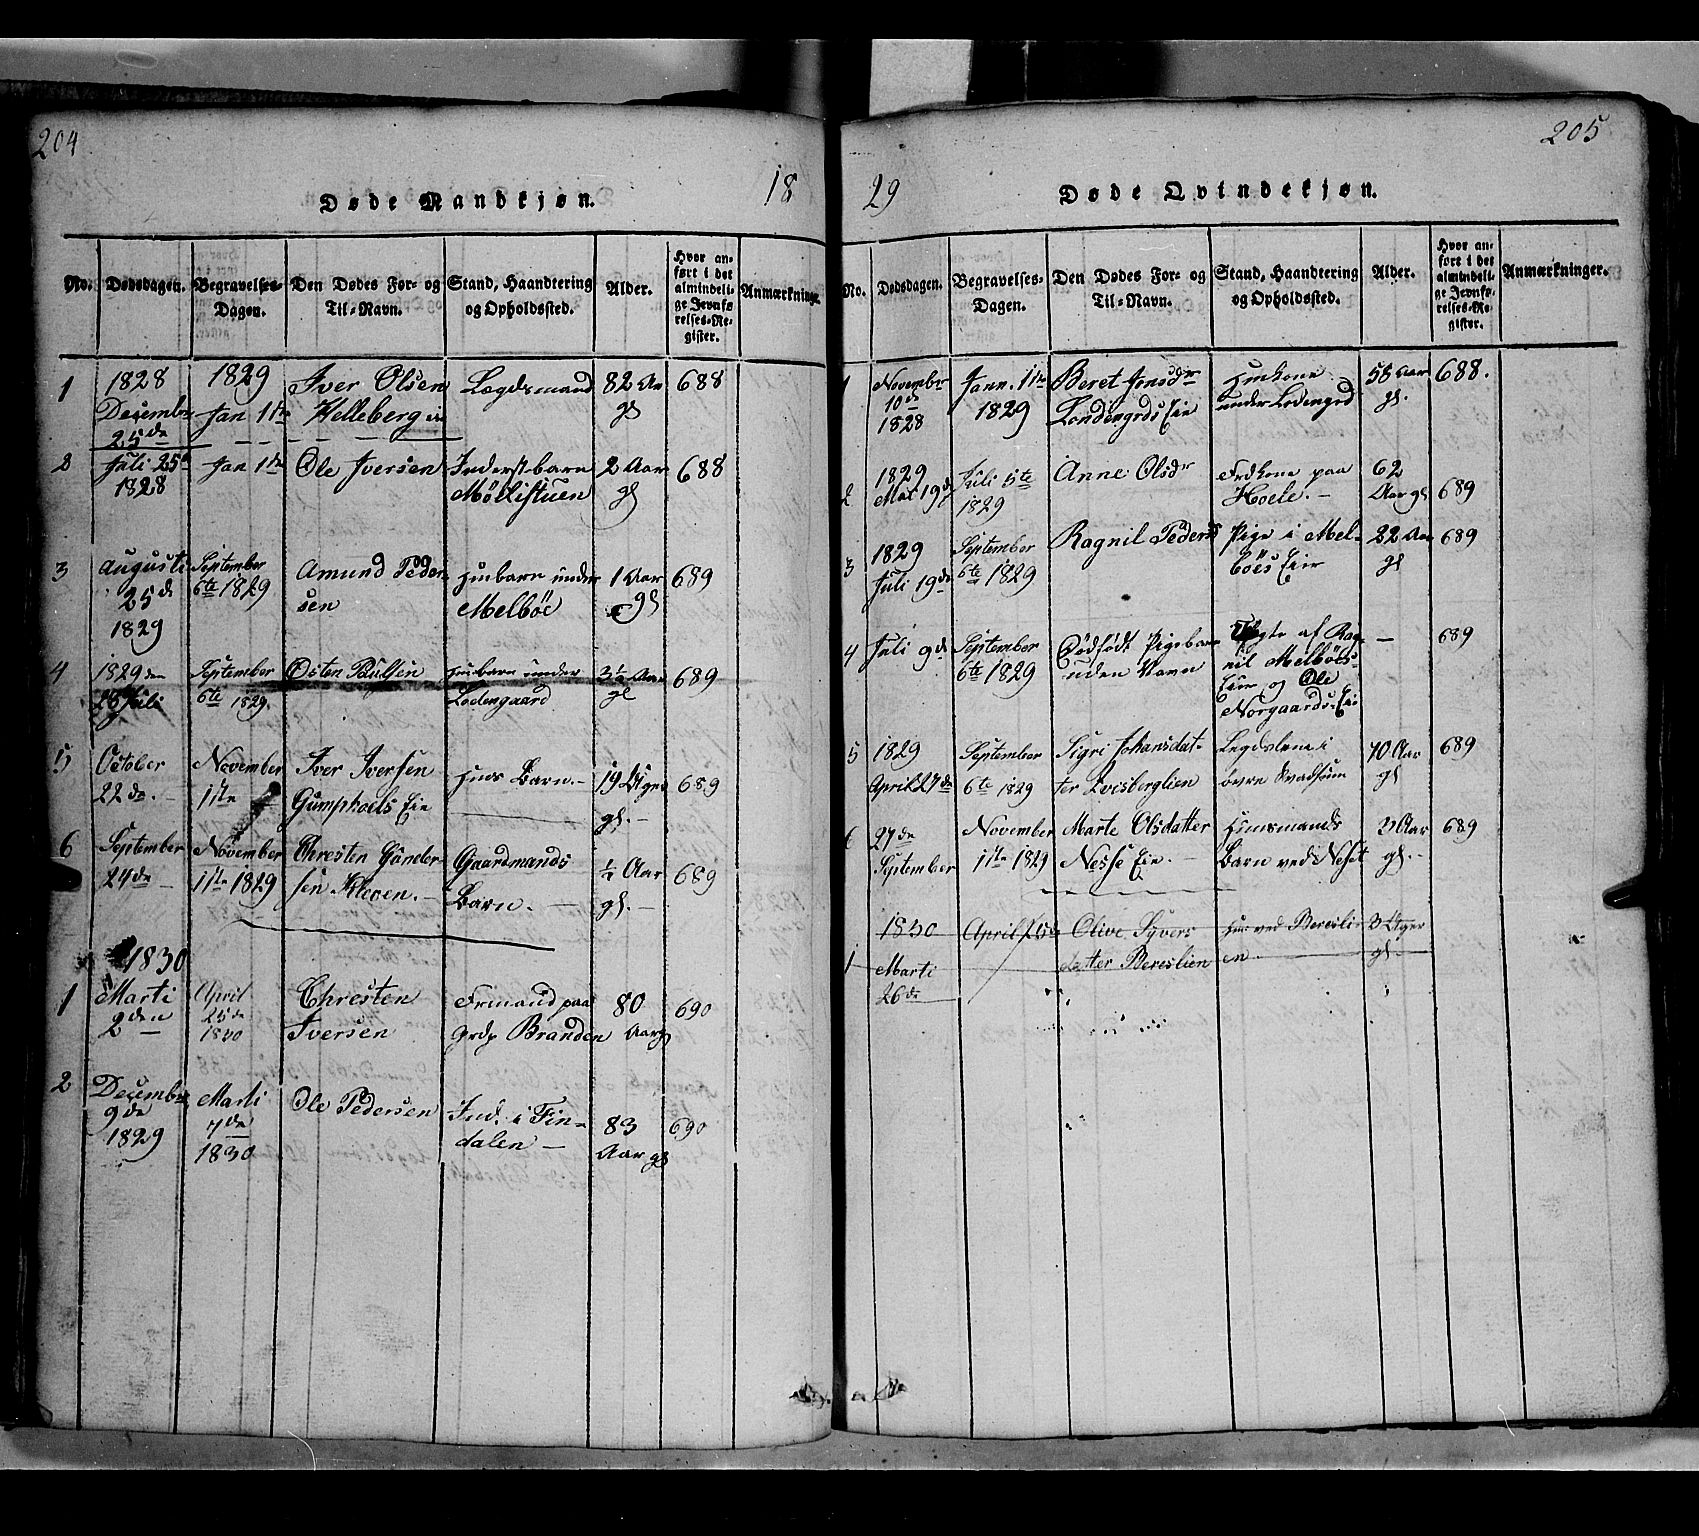 SAH, Gausdal prestekontor, Klokkerbok nr. 2, 1818-1874, s. 205a-205b